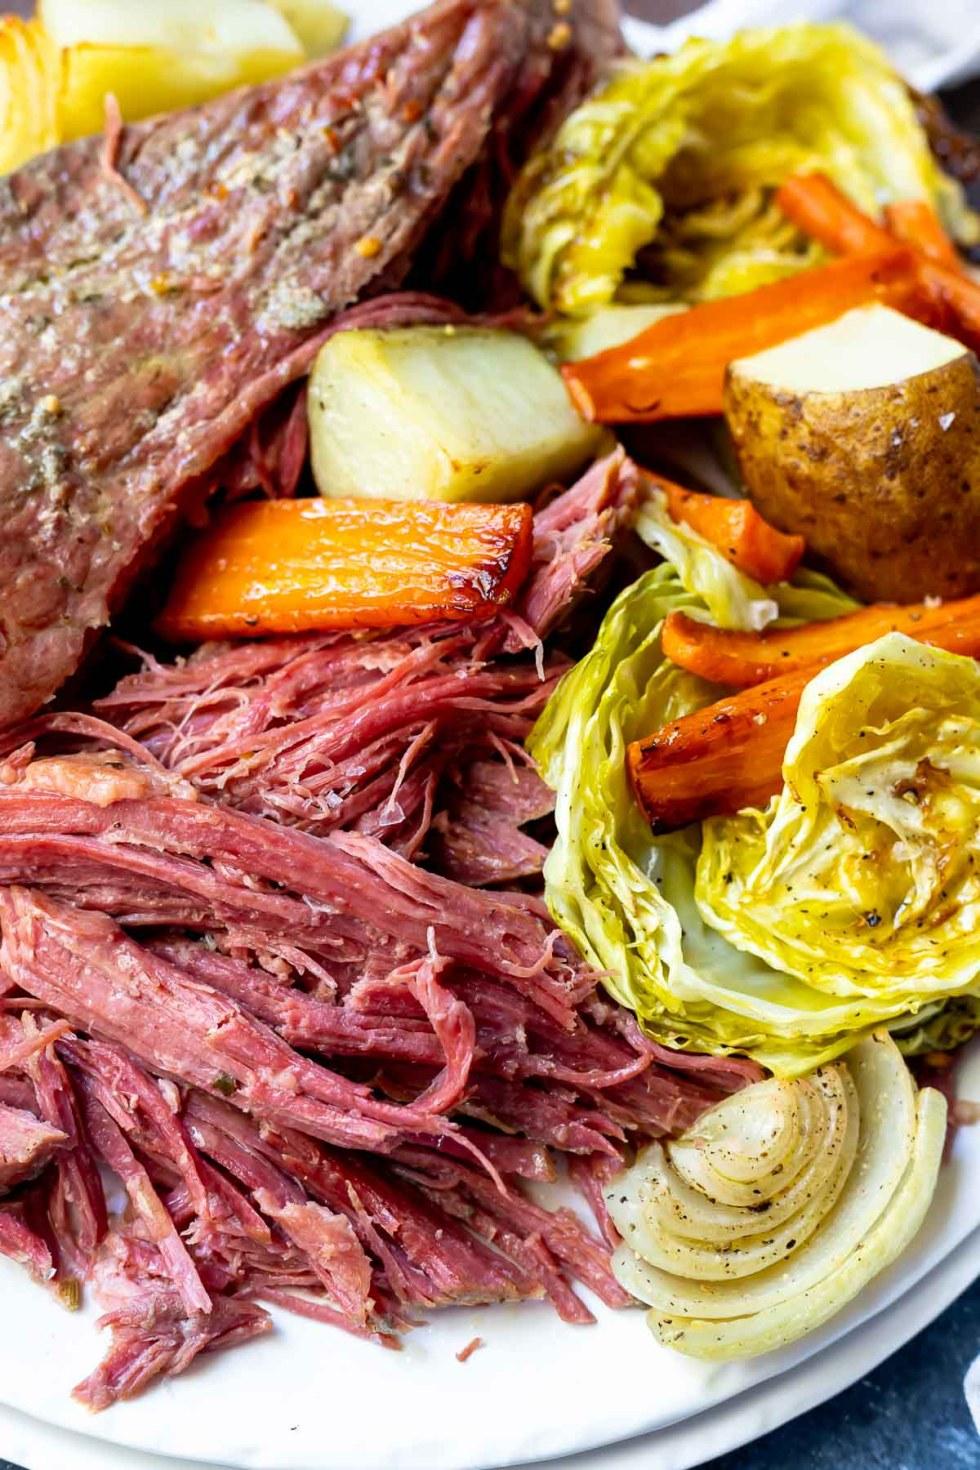 shredded corned beef recipe served on white platter with roasted vegetables